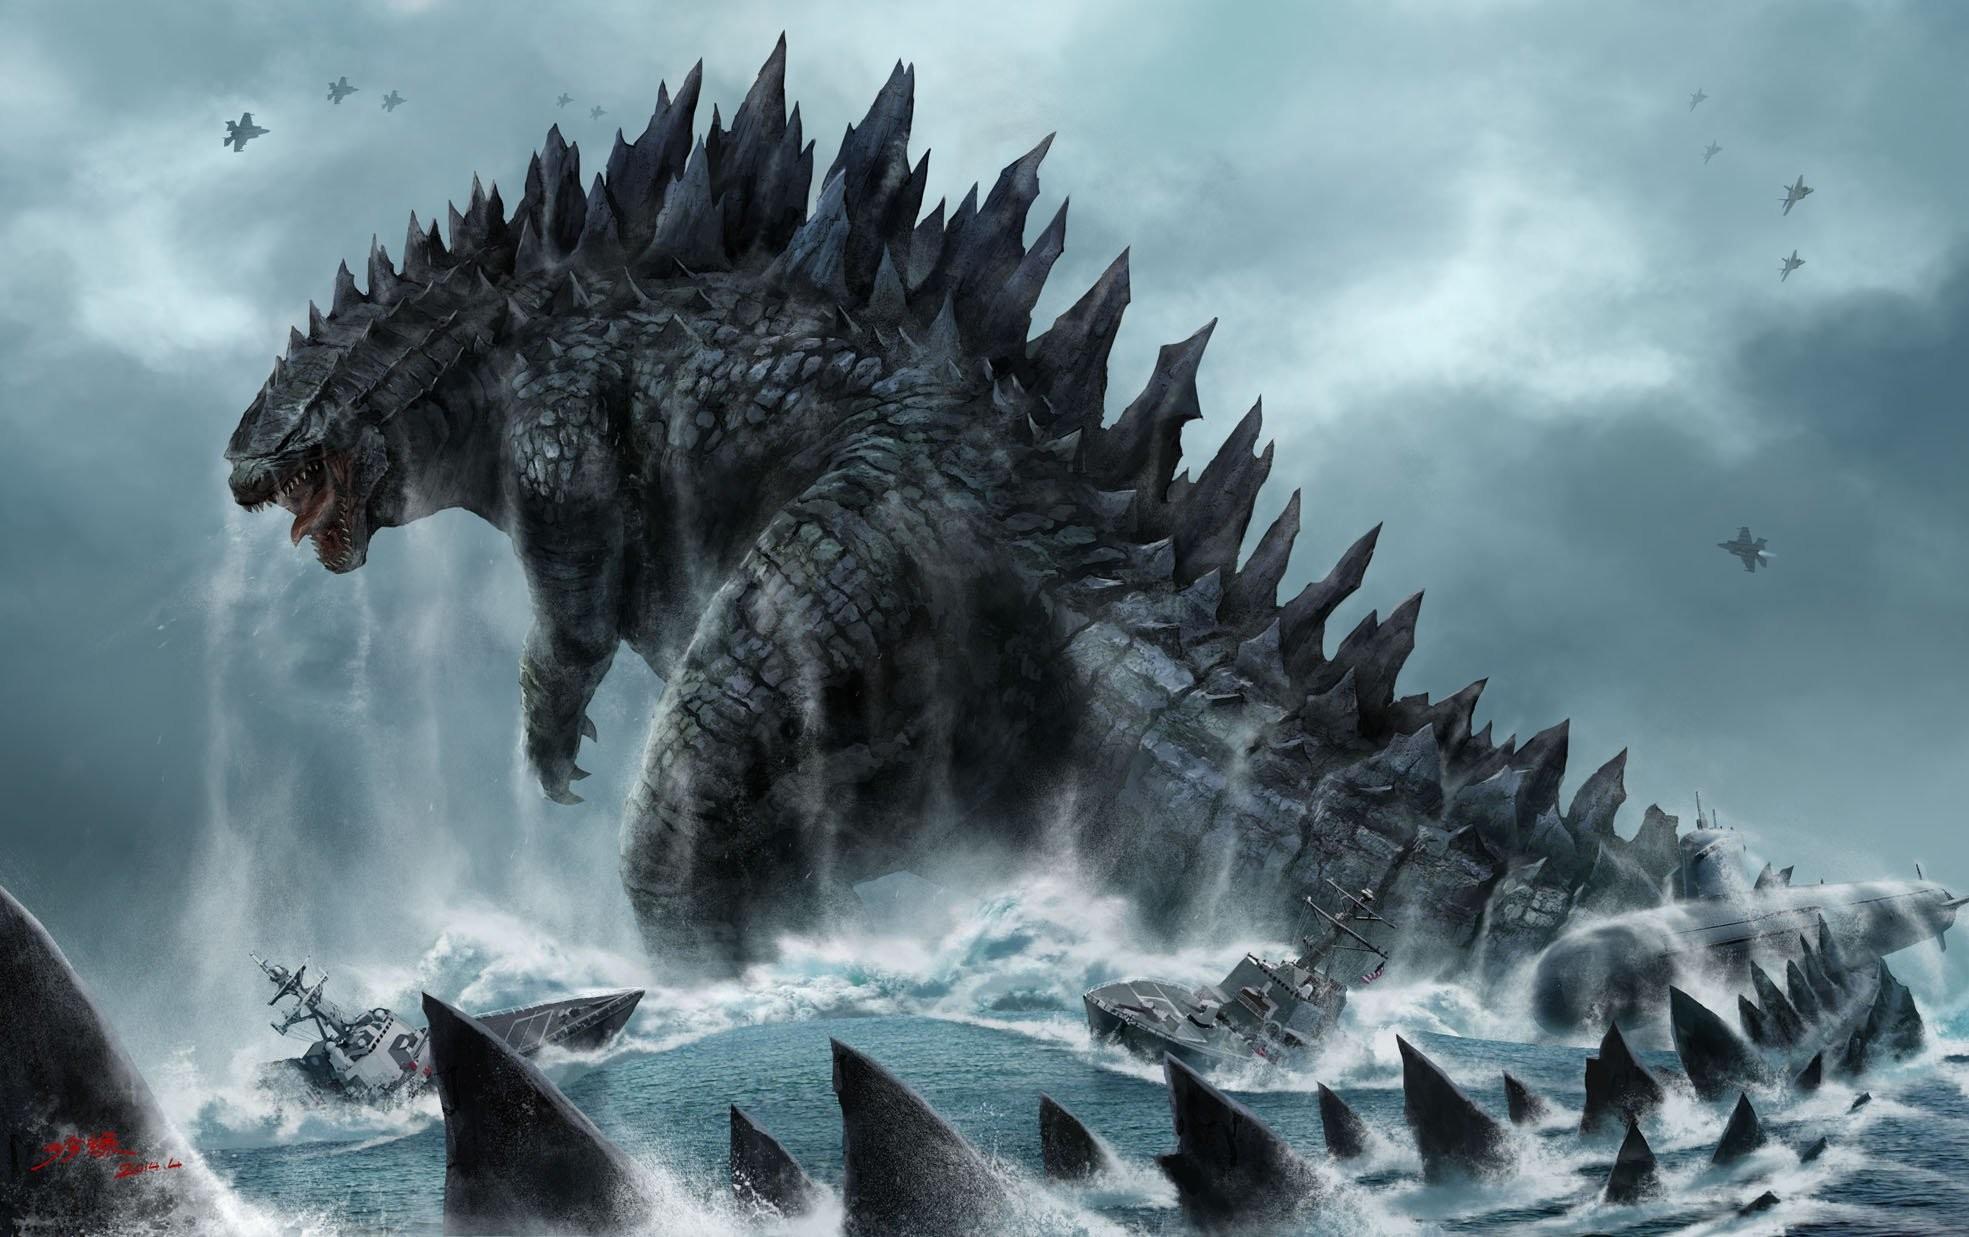 Godzilla Wallpaper | Latest Hd Wallpapers